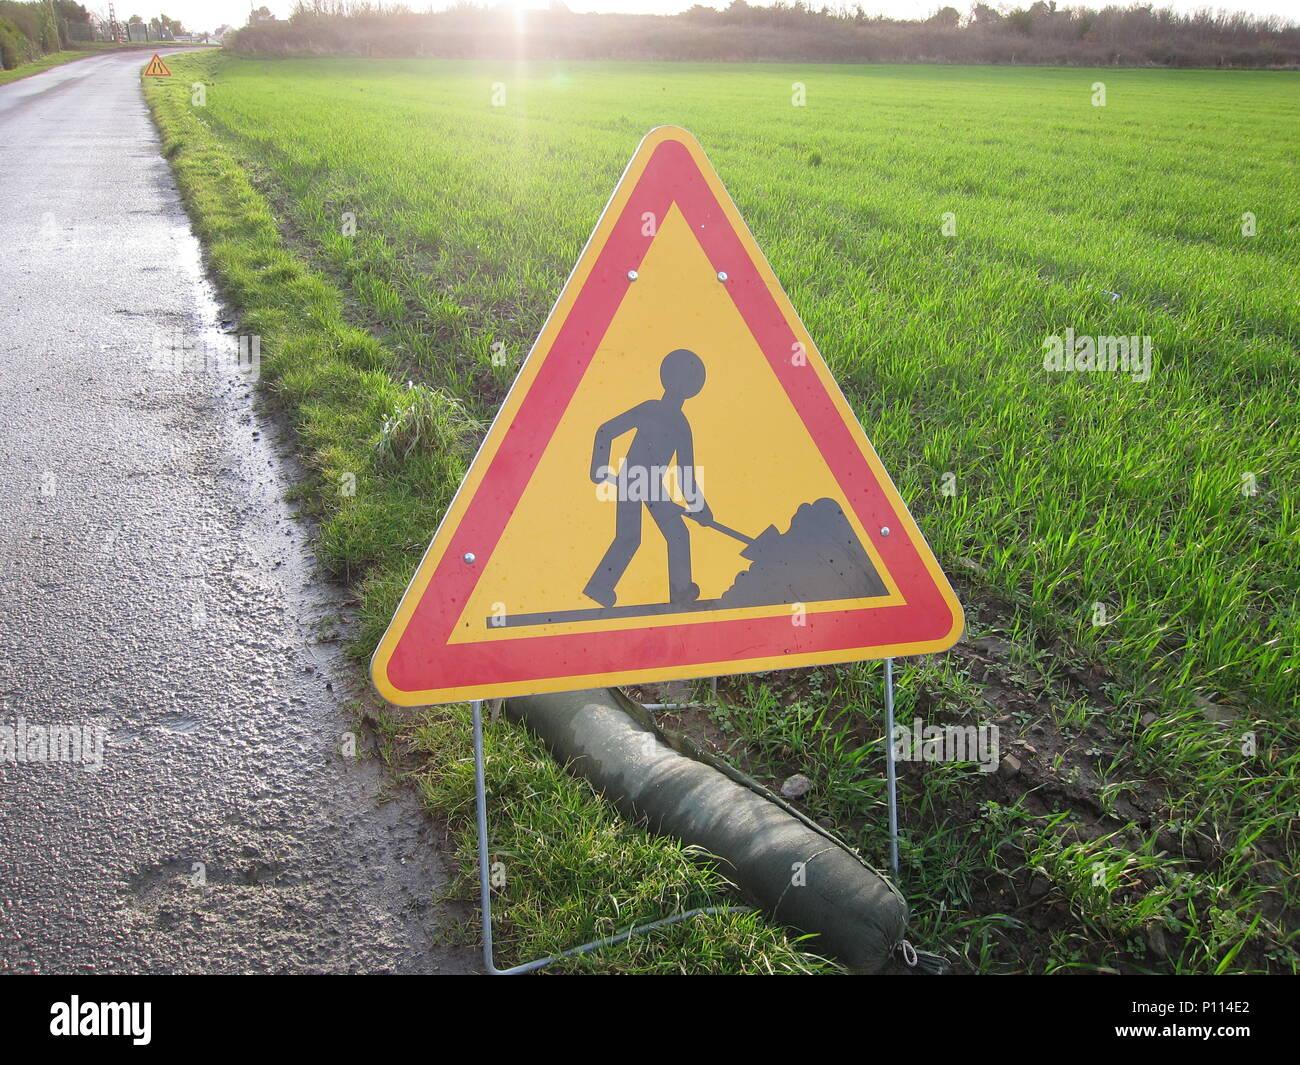 PLERIN, FRANCE 15 MARCH, 2018: Road sign in Plerin on roselier road - Stock Image